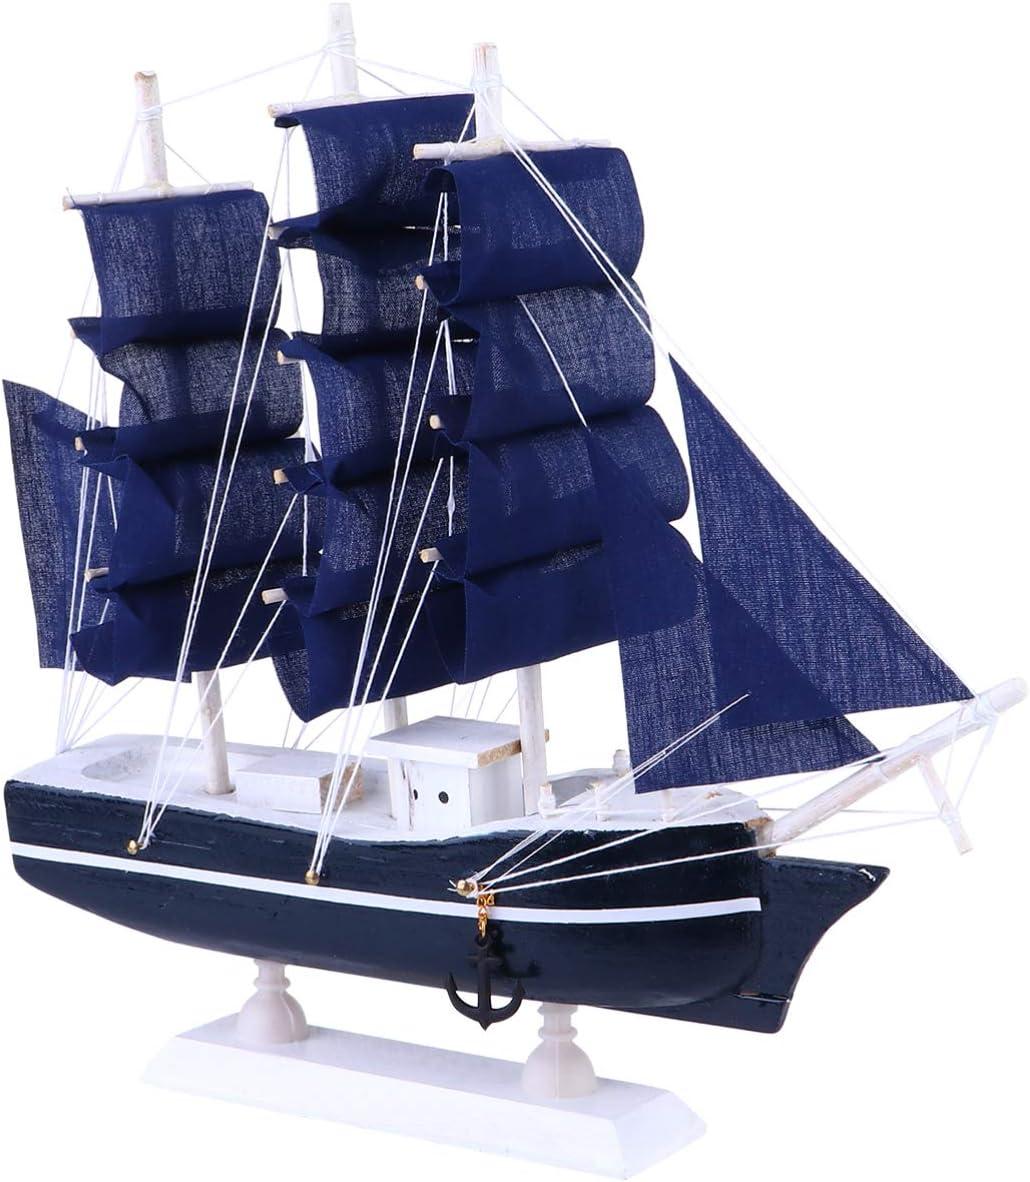 Wakauto Sailing Ship Model Decor Nautical Sail Ship Sailboat Vintage Ship Model for Tabletop Ornament Ocean Theme Home Decor (Blue,Navy)